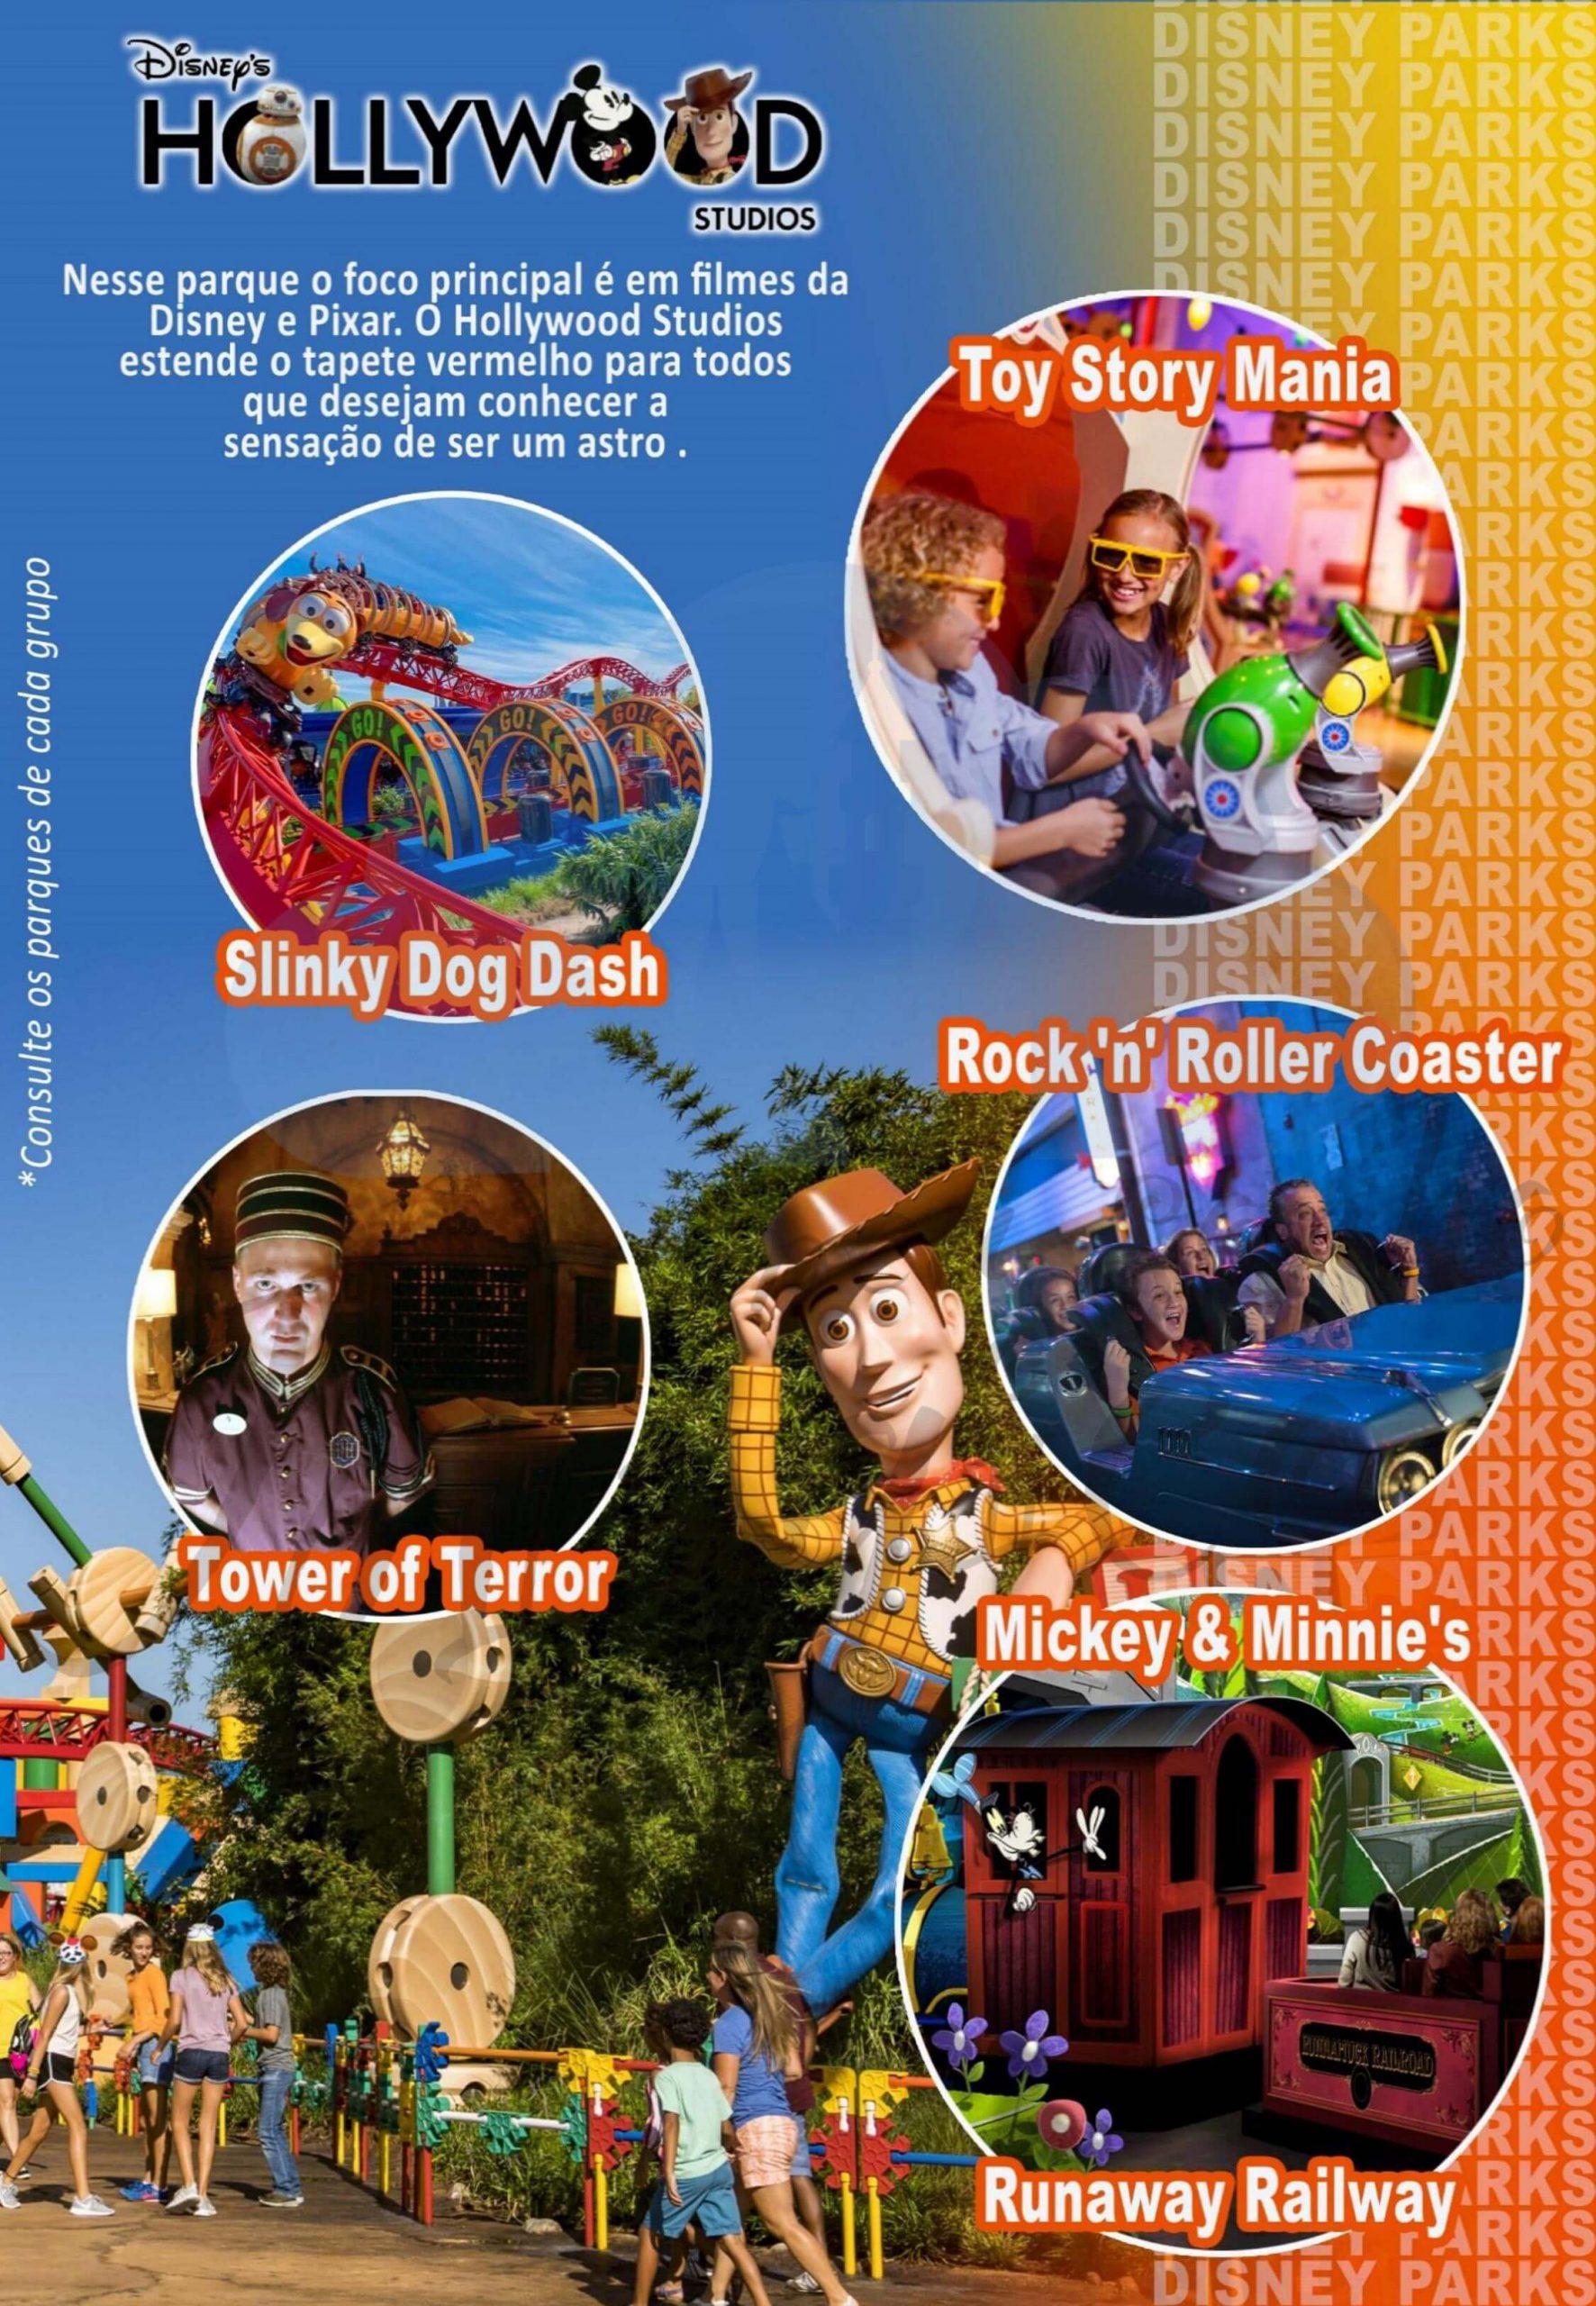 Grupo Teen Inverno - Disney Janeiro 2023 3